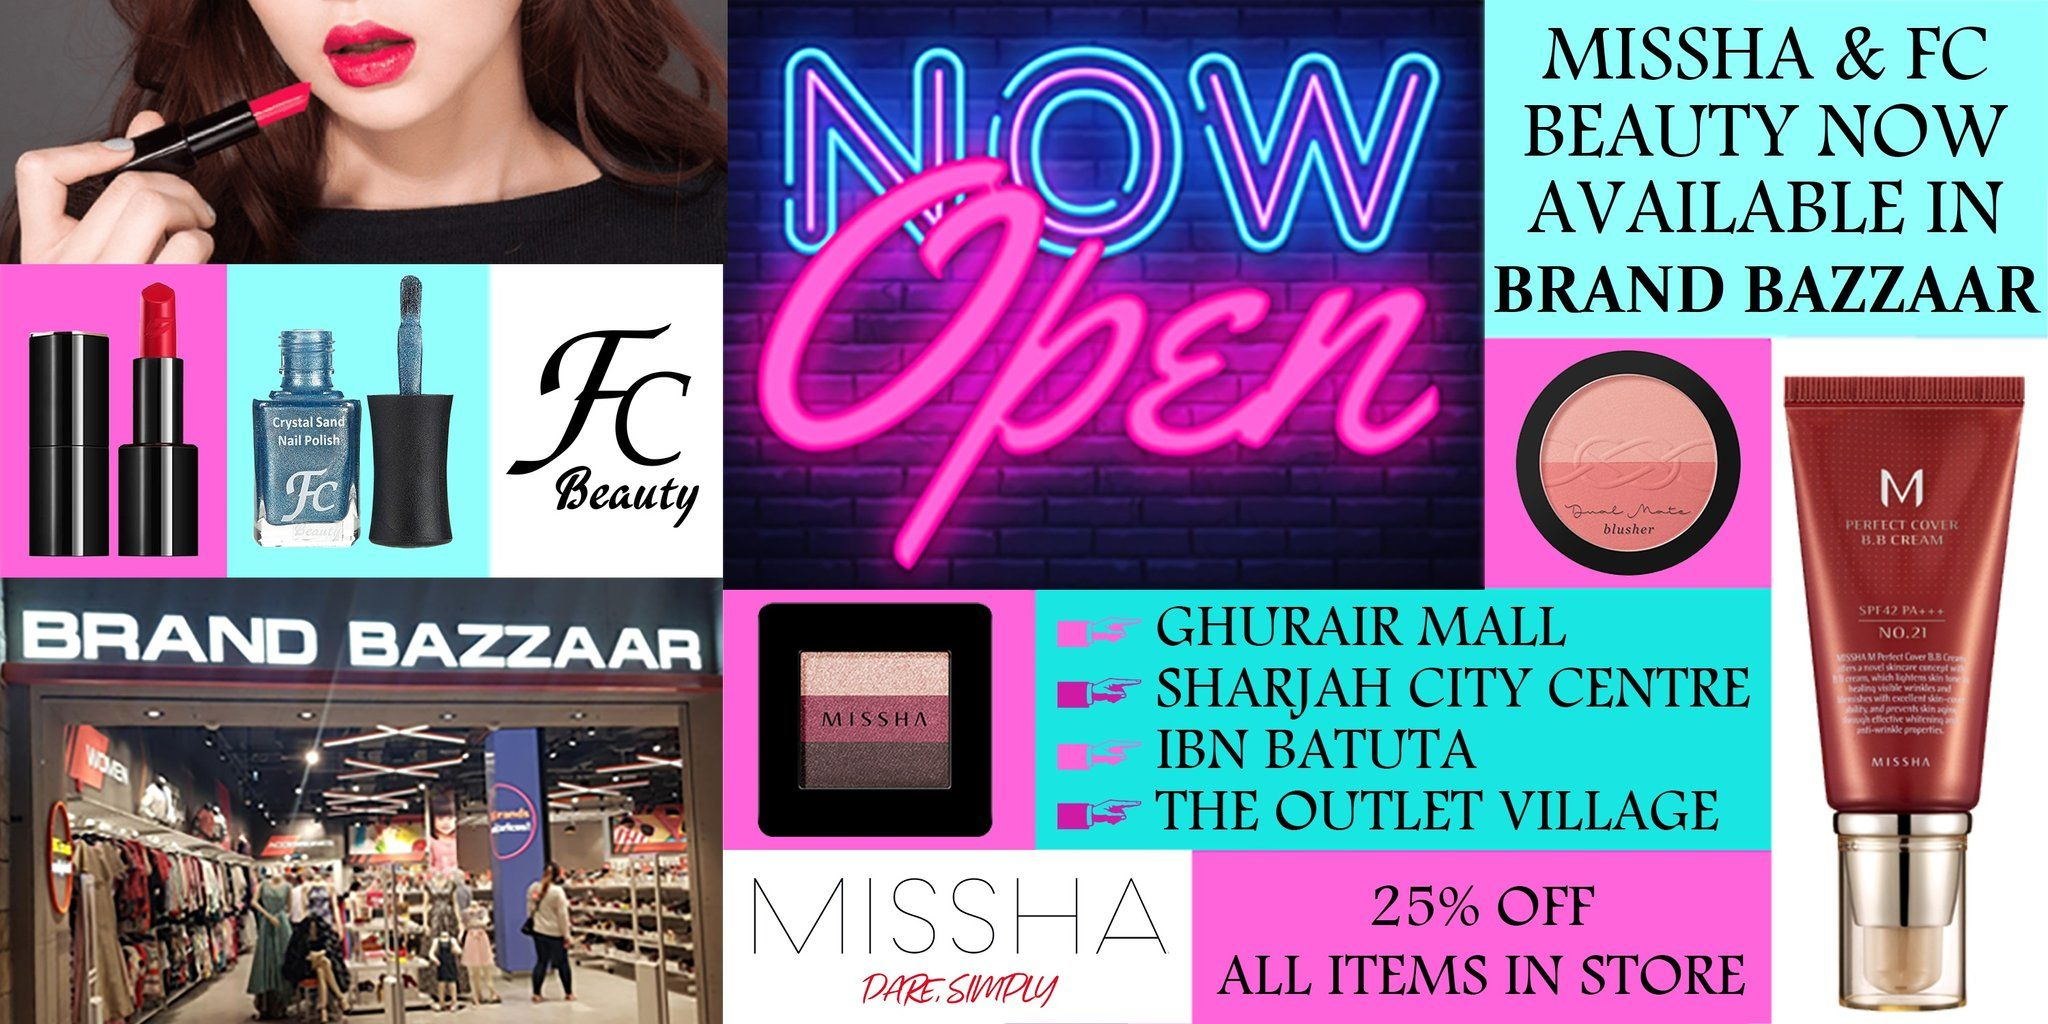 Korea's Top Makeup and Skincare Brand Missha Middle East